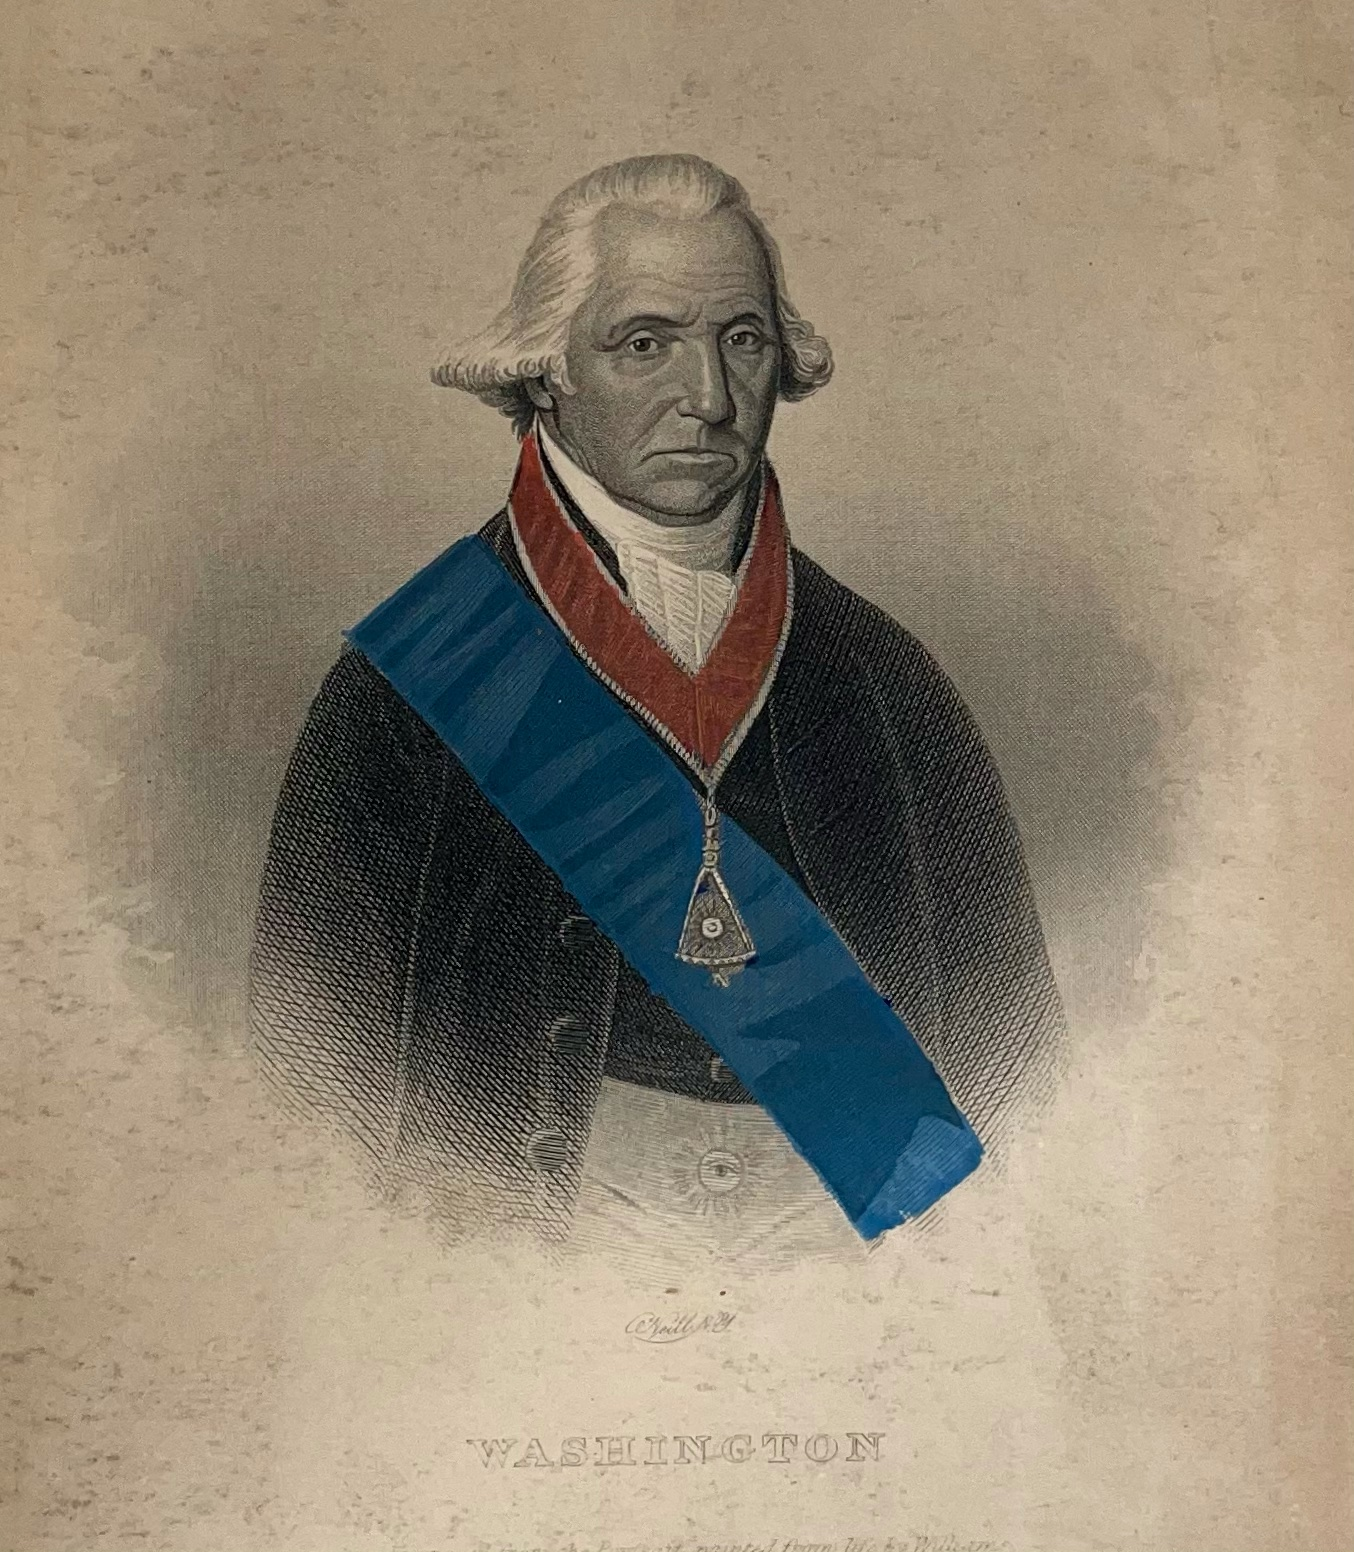 George Washington engraving by John A. O'Neill based on a William Joseph Williams portrait